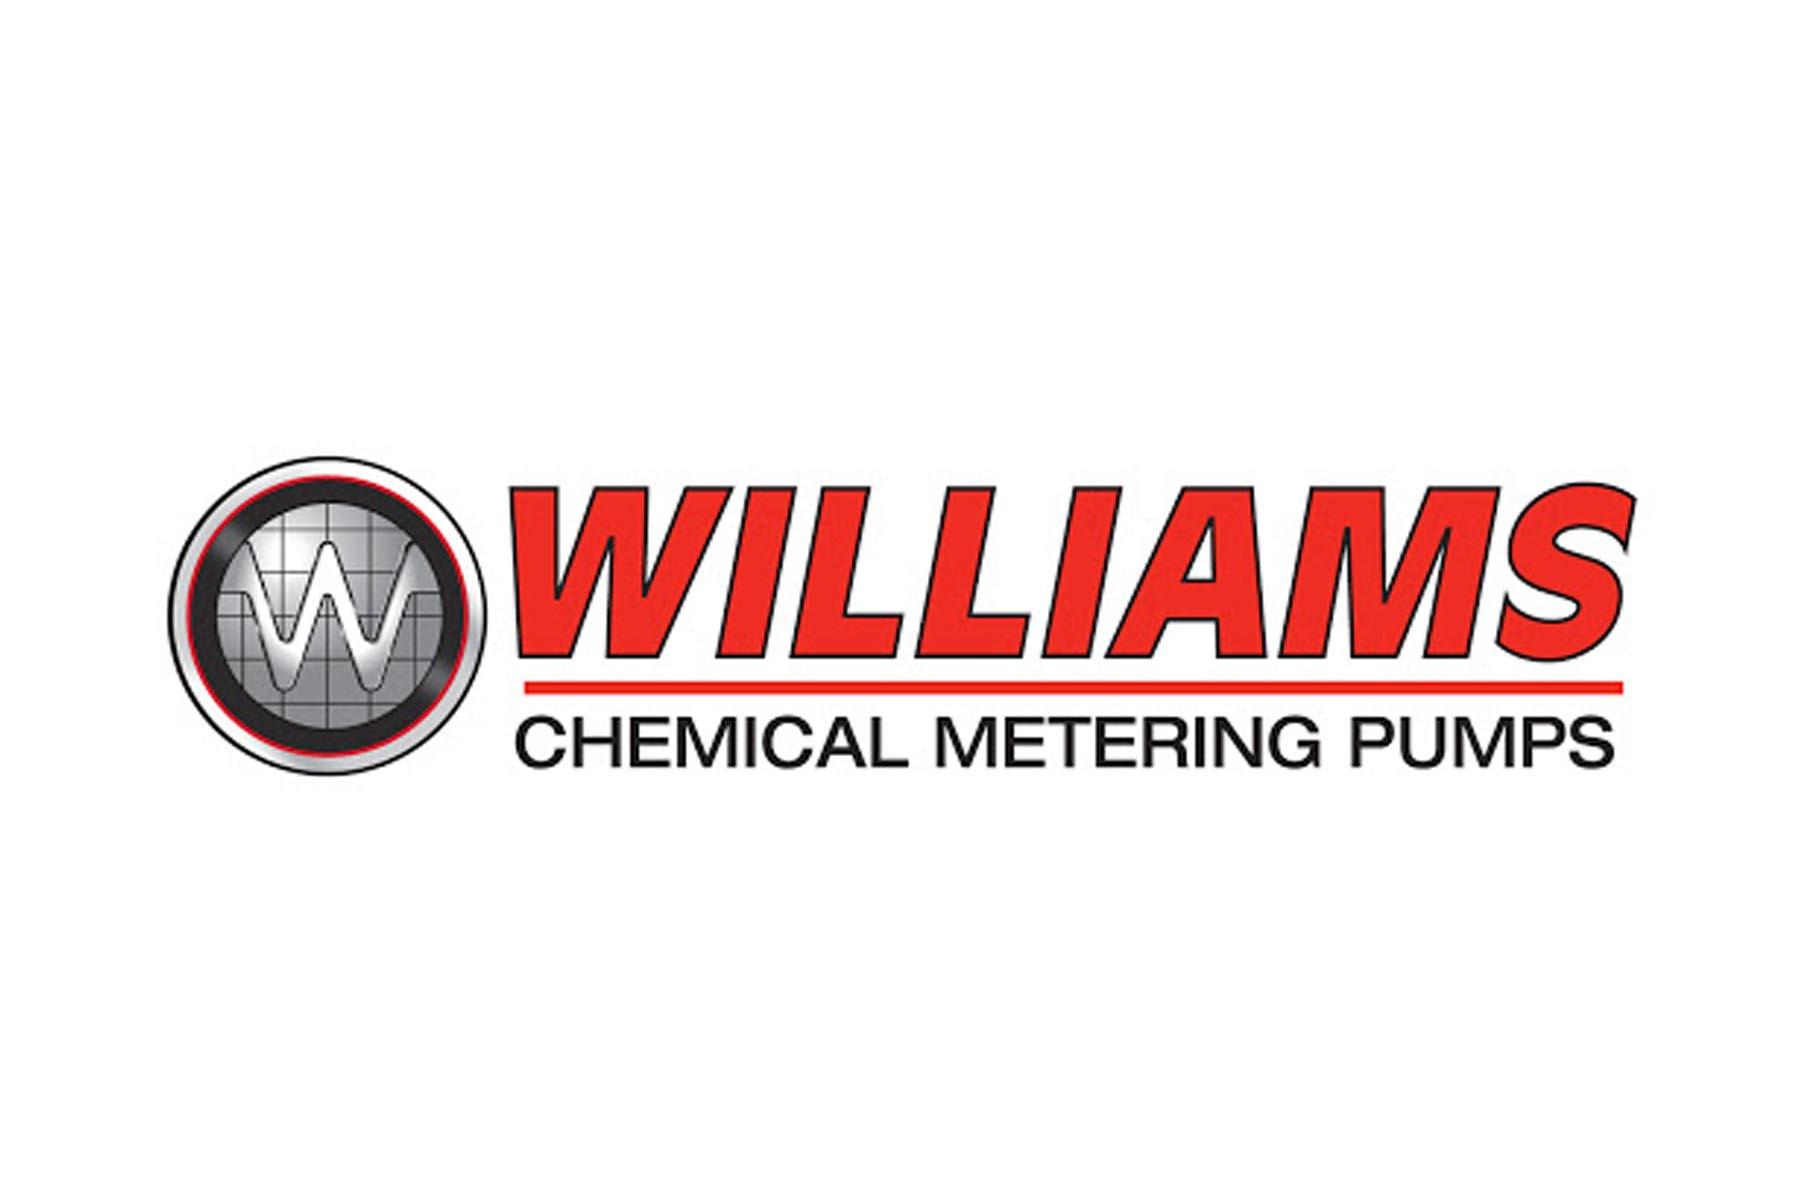 Williams Pumps